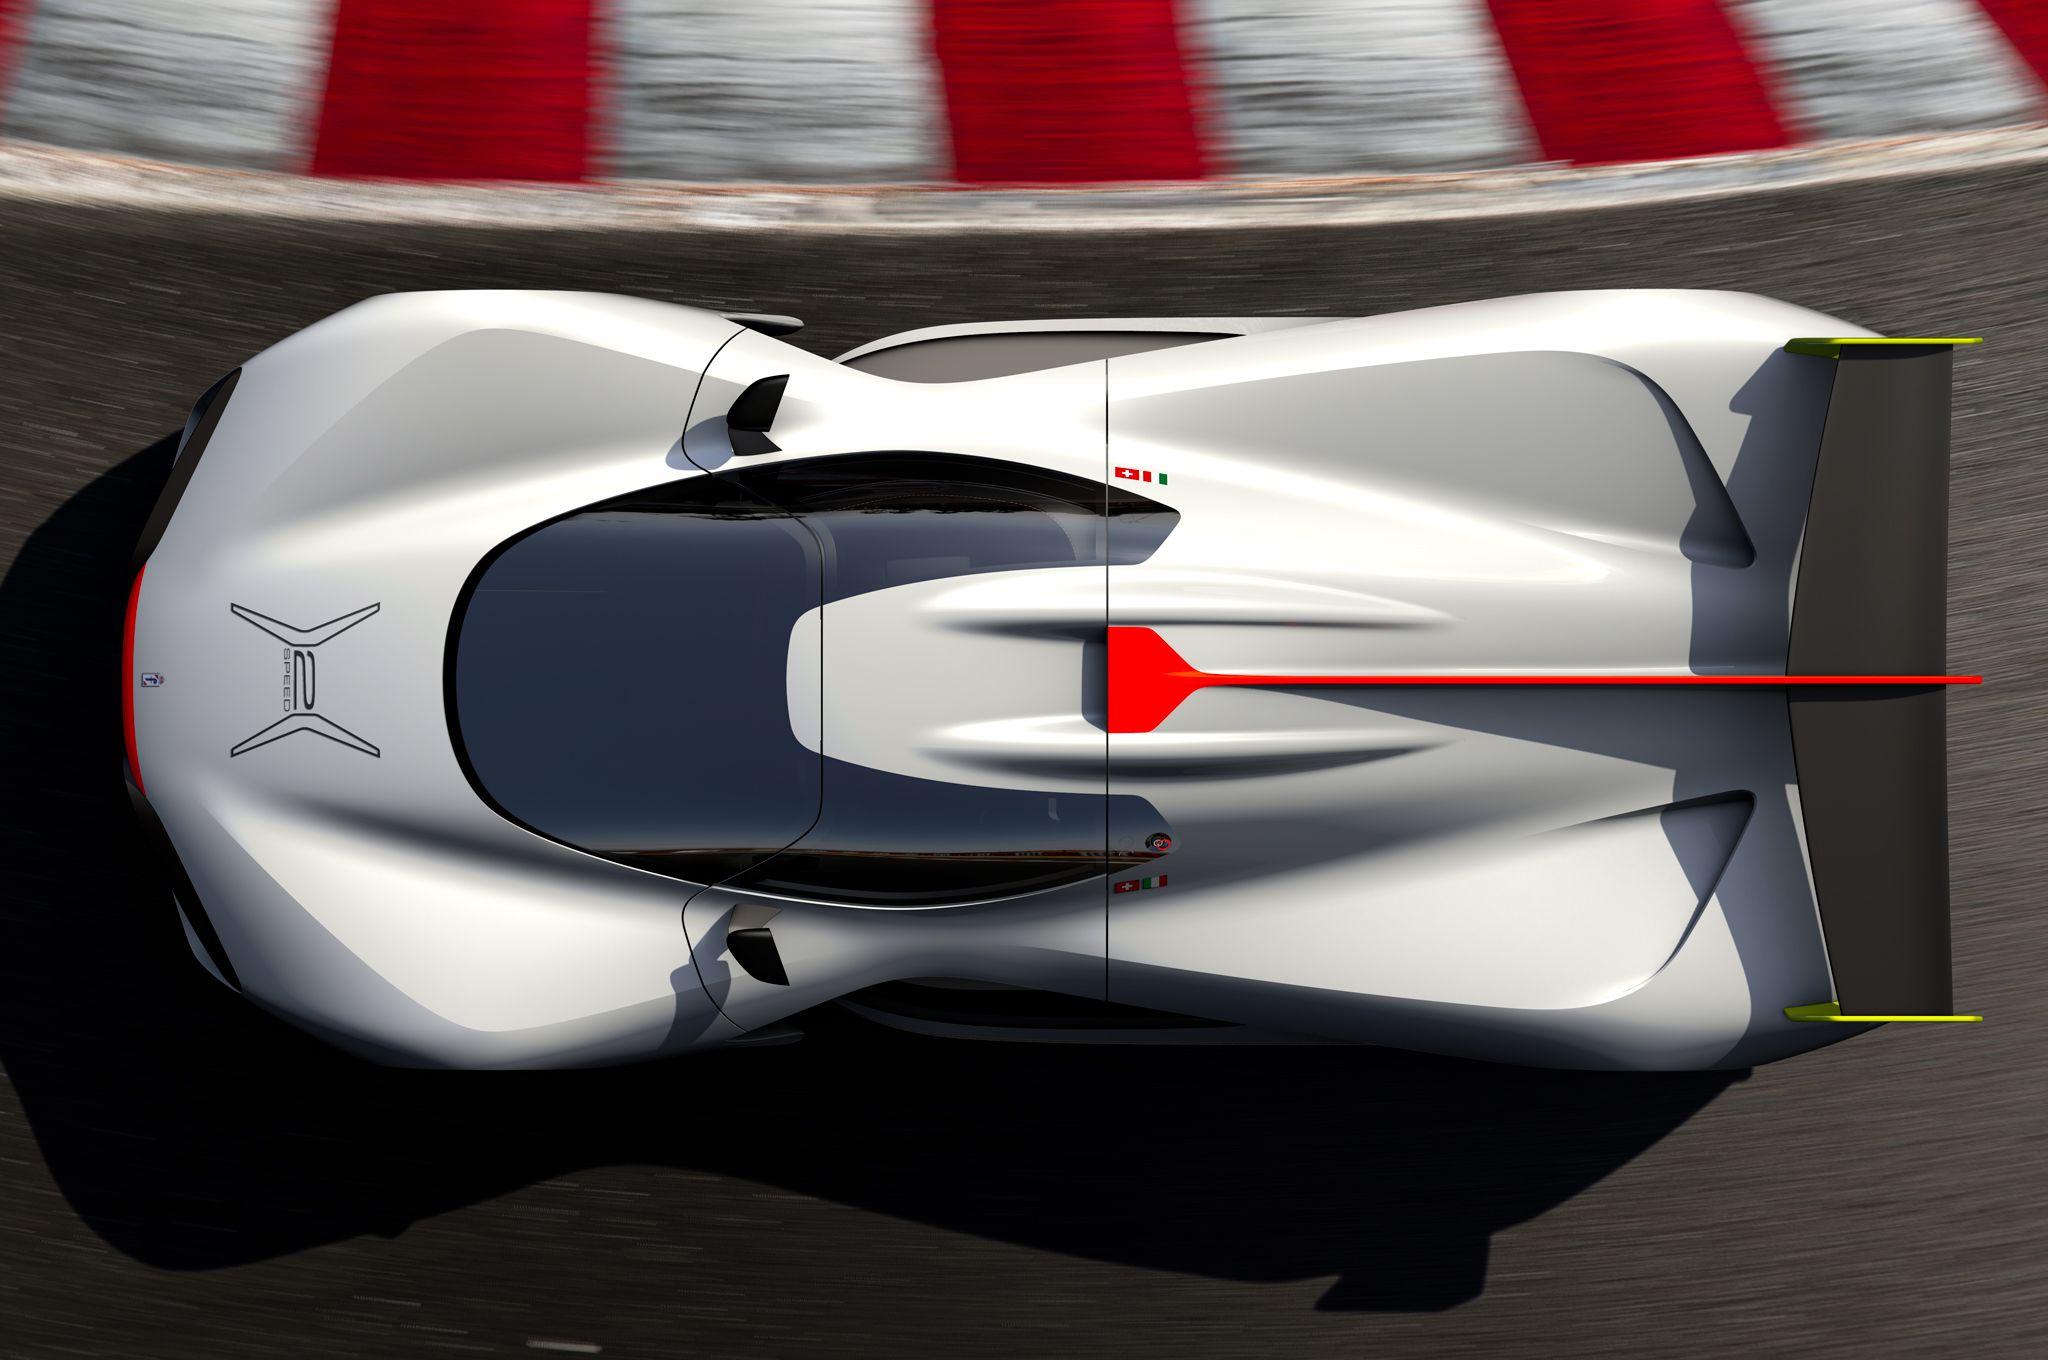 Pininfarina-H2-Speed-Concept-top-view.jpg (2048×1360)